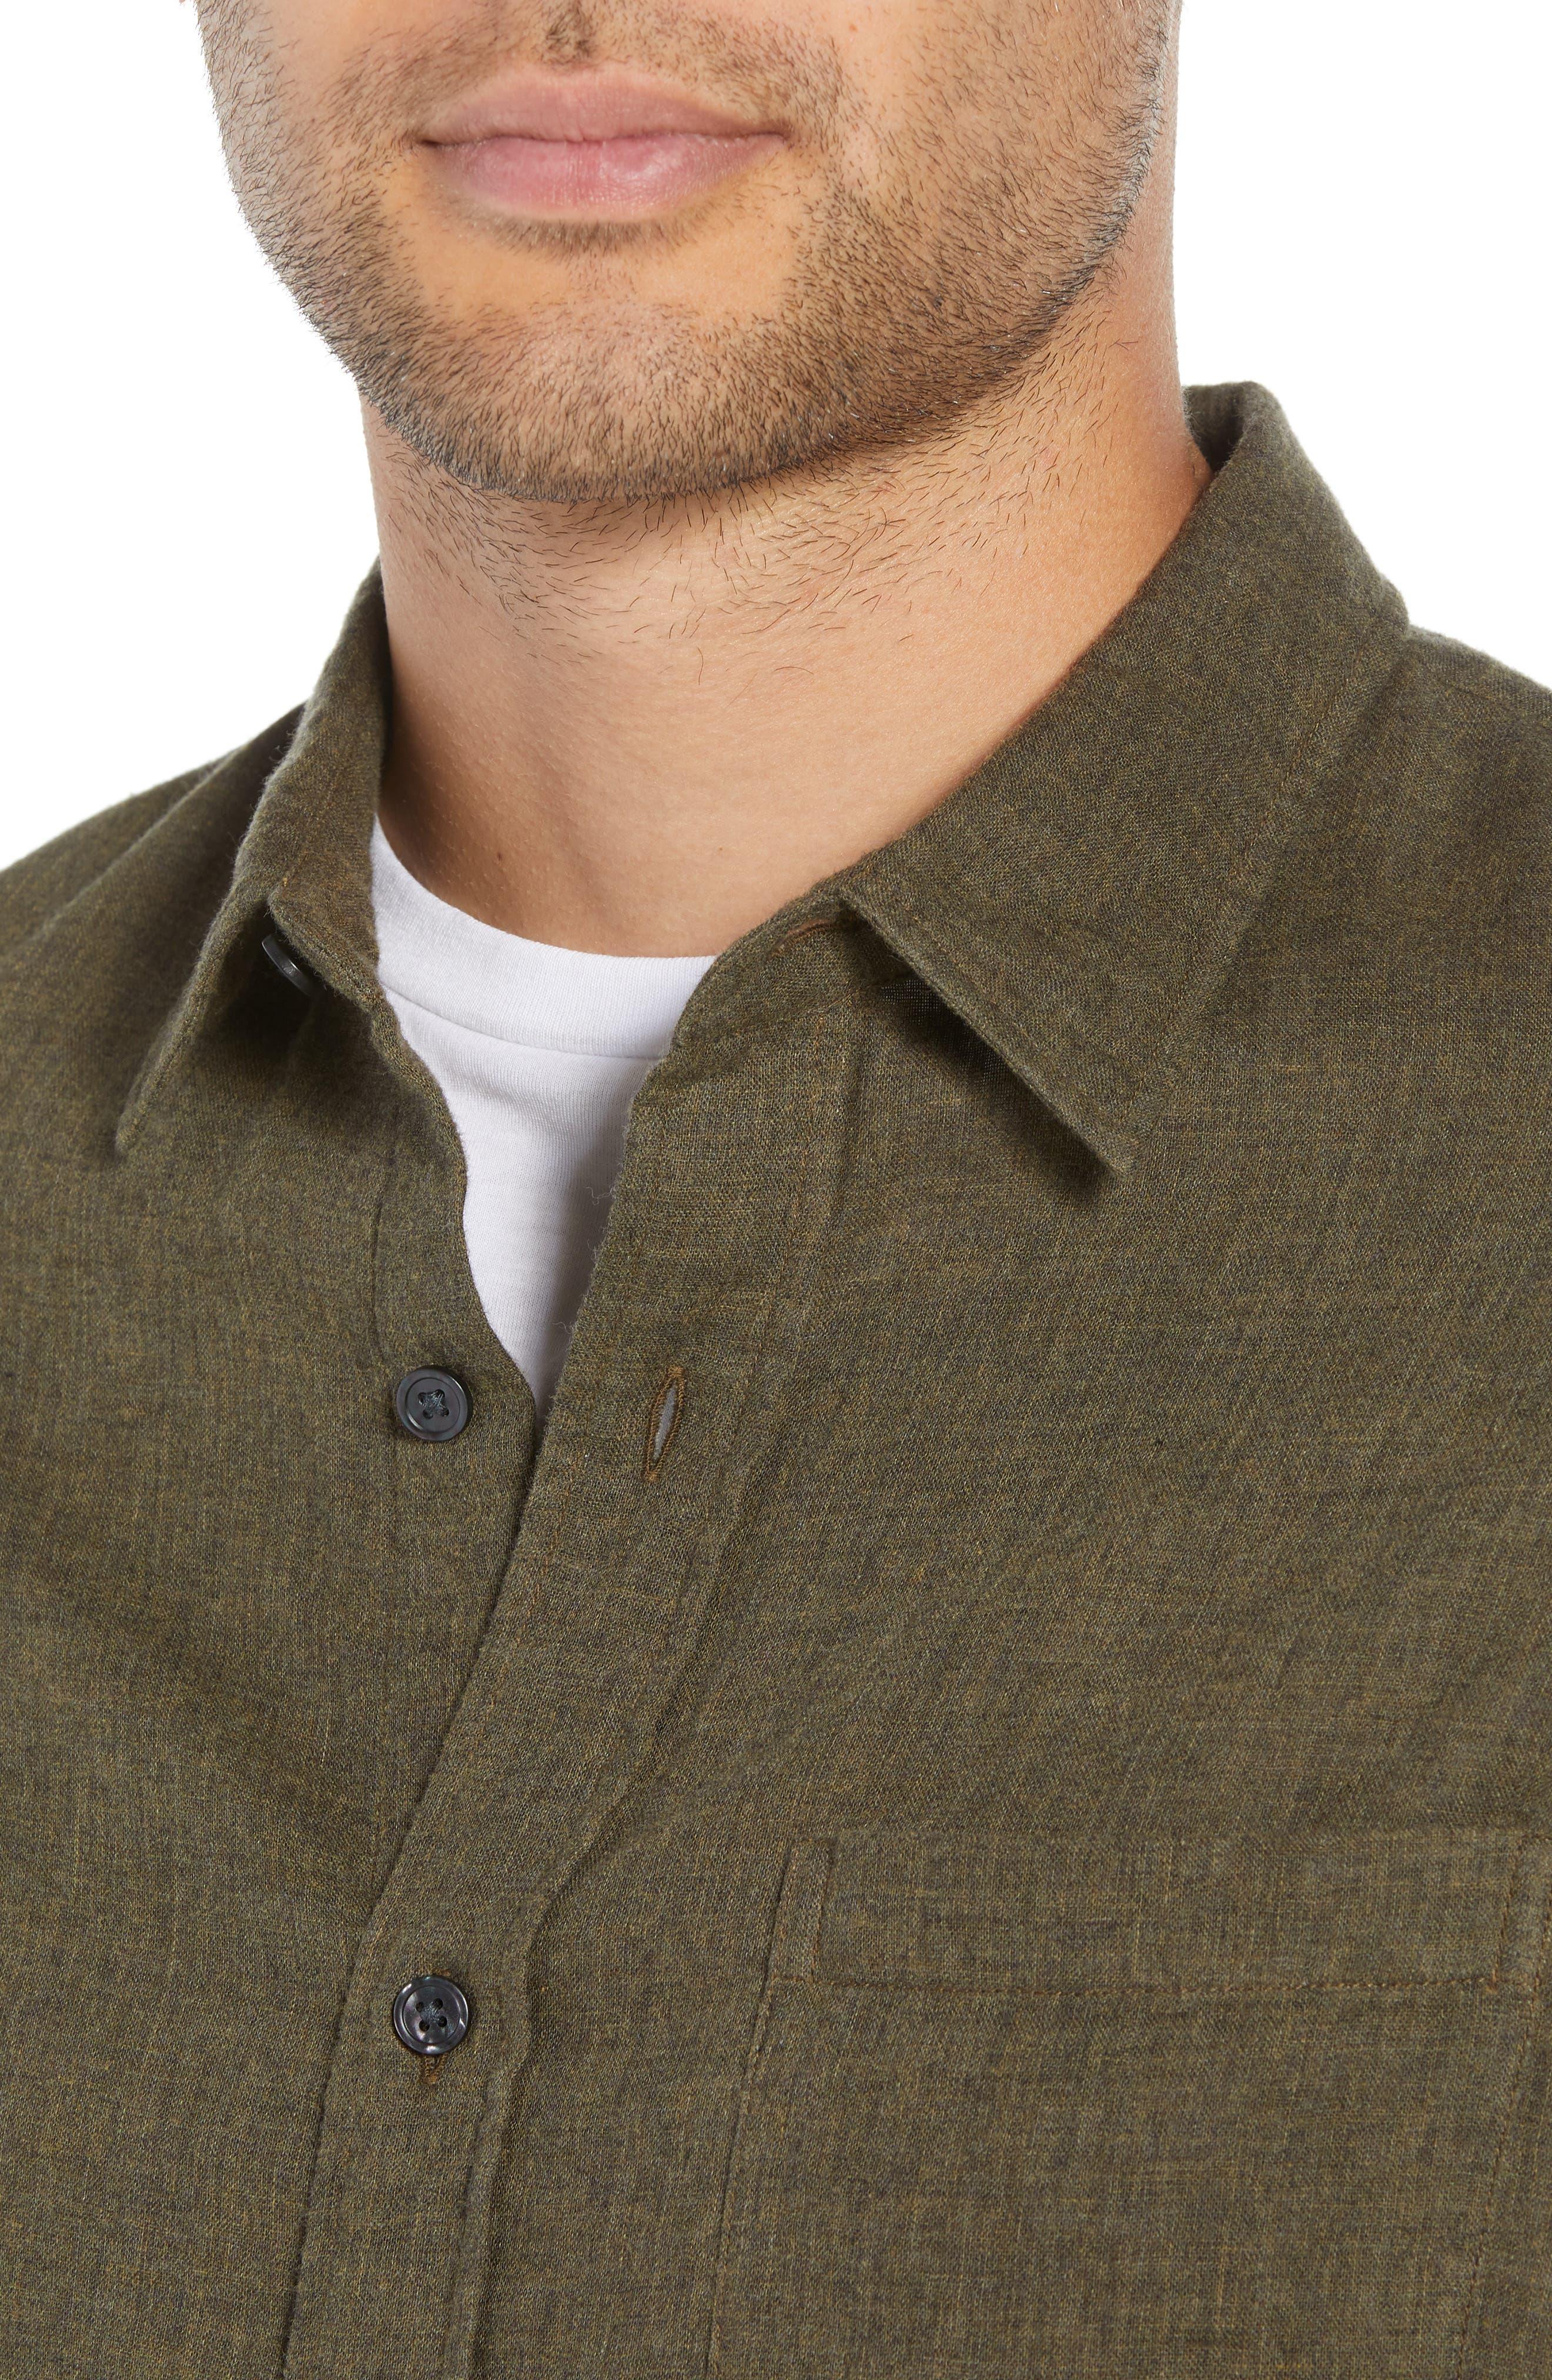 Classic Fit Double Knit Sport Shirt,                             Alternate thumbnail 2, color,                             H OLIVE